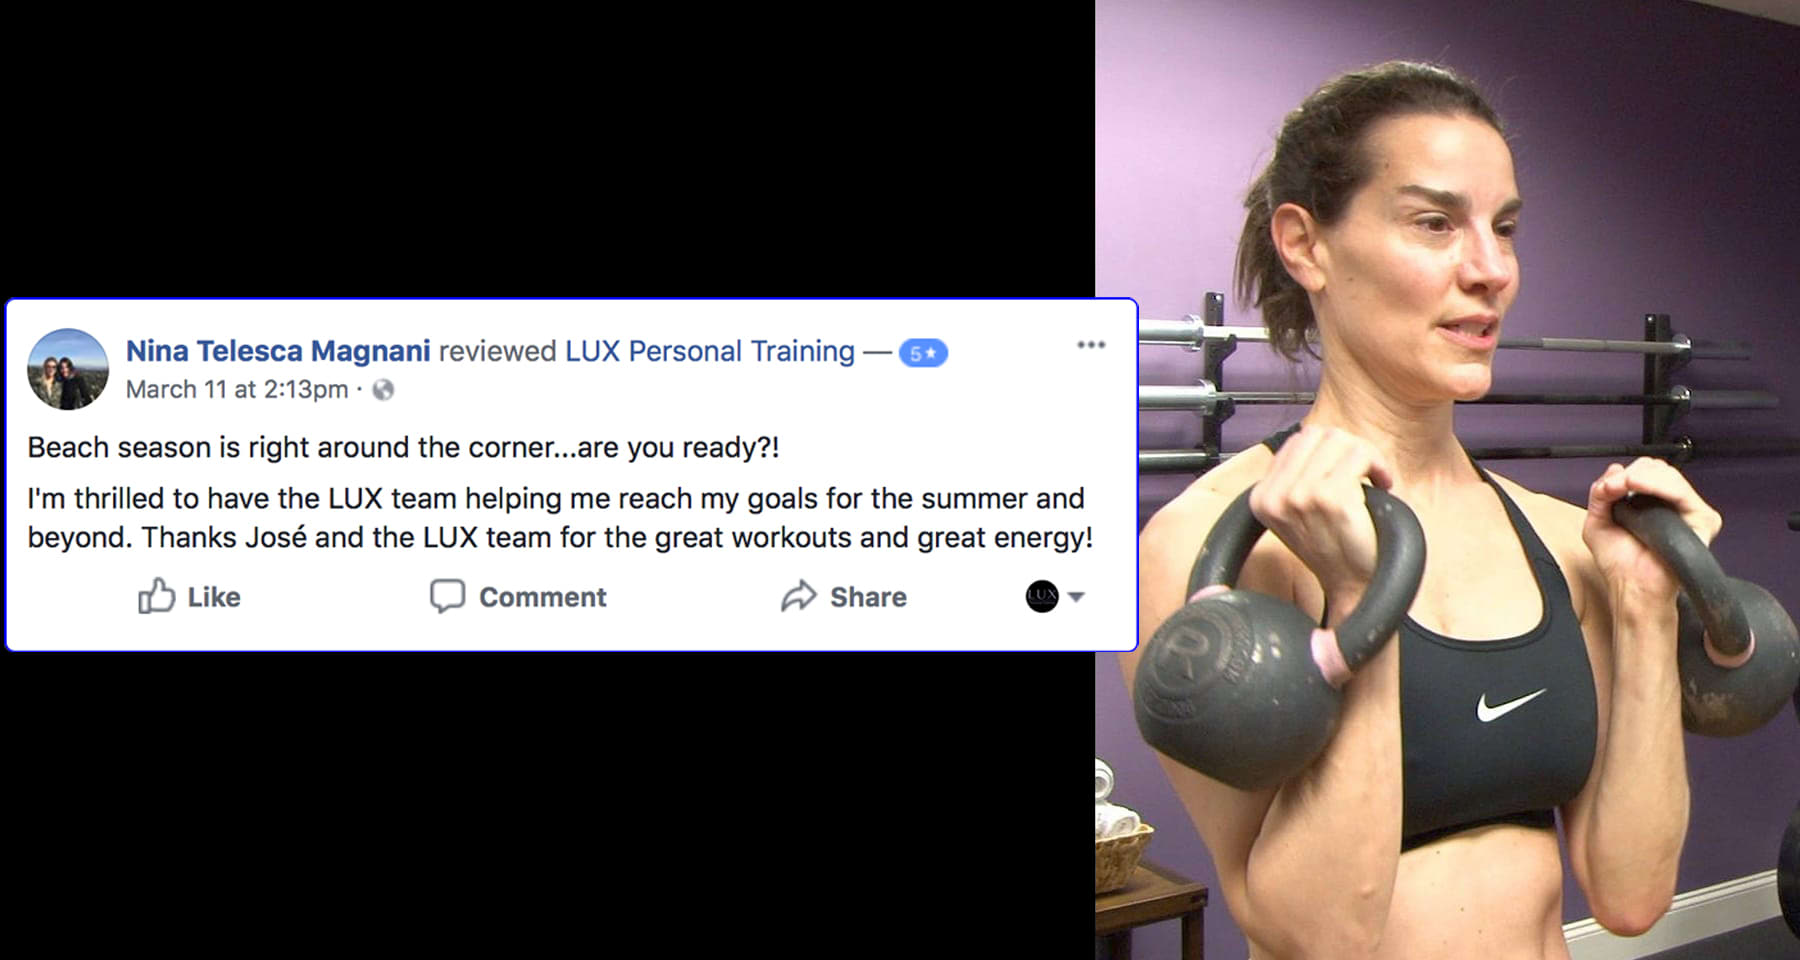 Nina, LUX Personal Training Testimonials